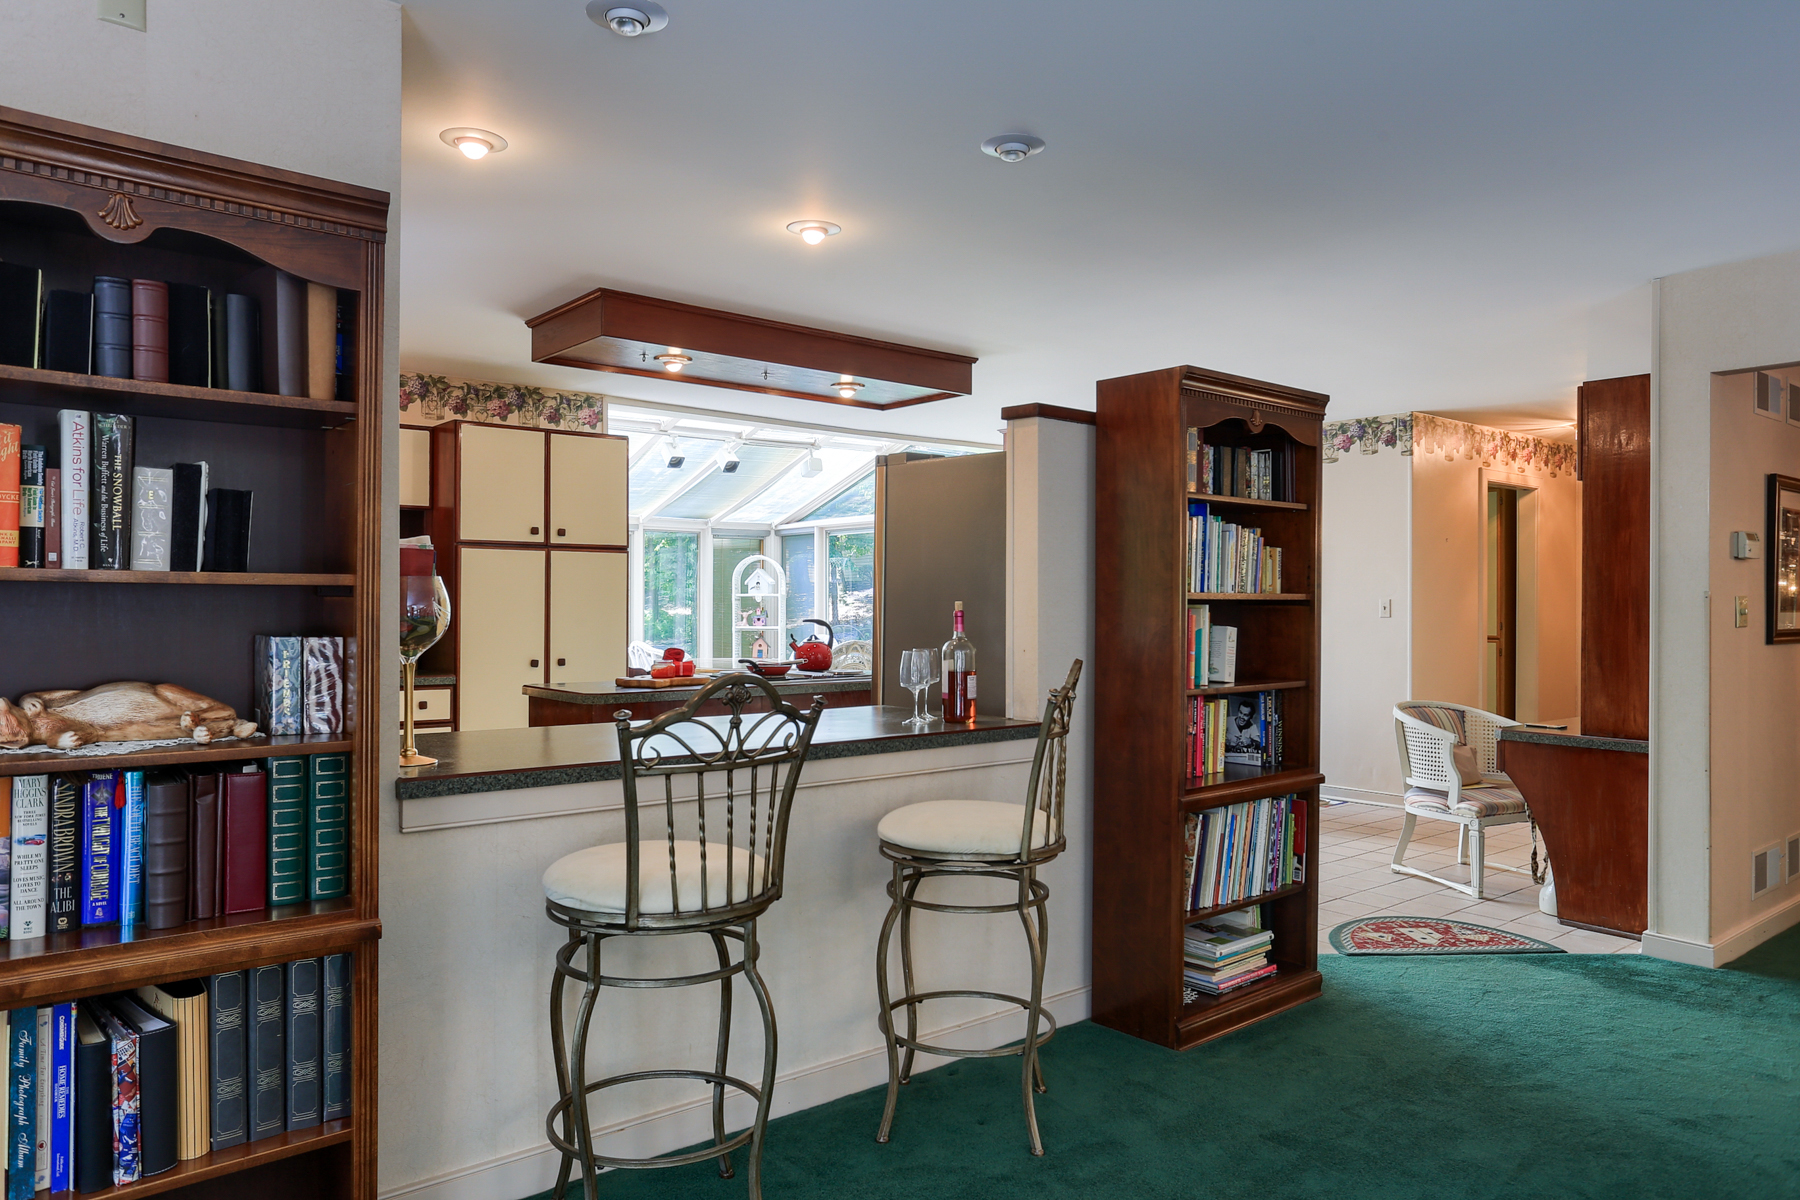 Additional photo for property listing at 1265 Ash Lane  Lebanon, Pennsylvania 17042 Estados Unidos